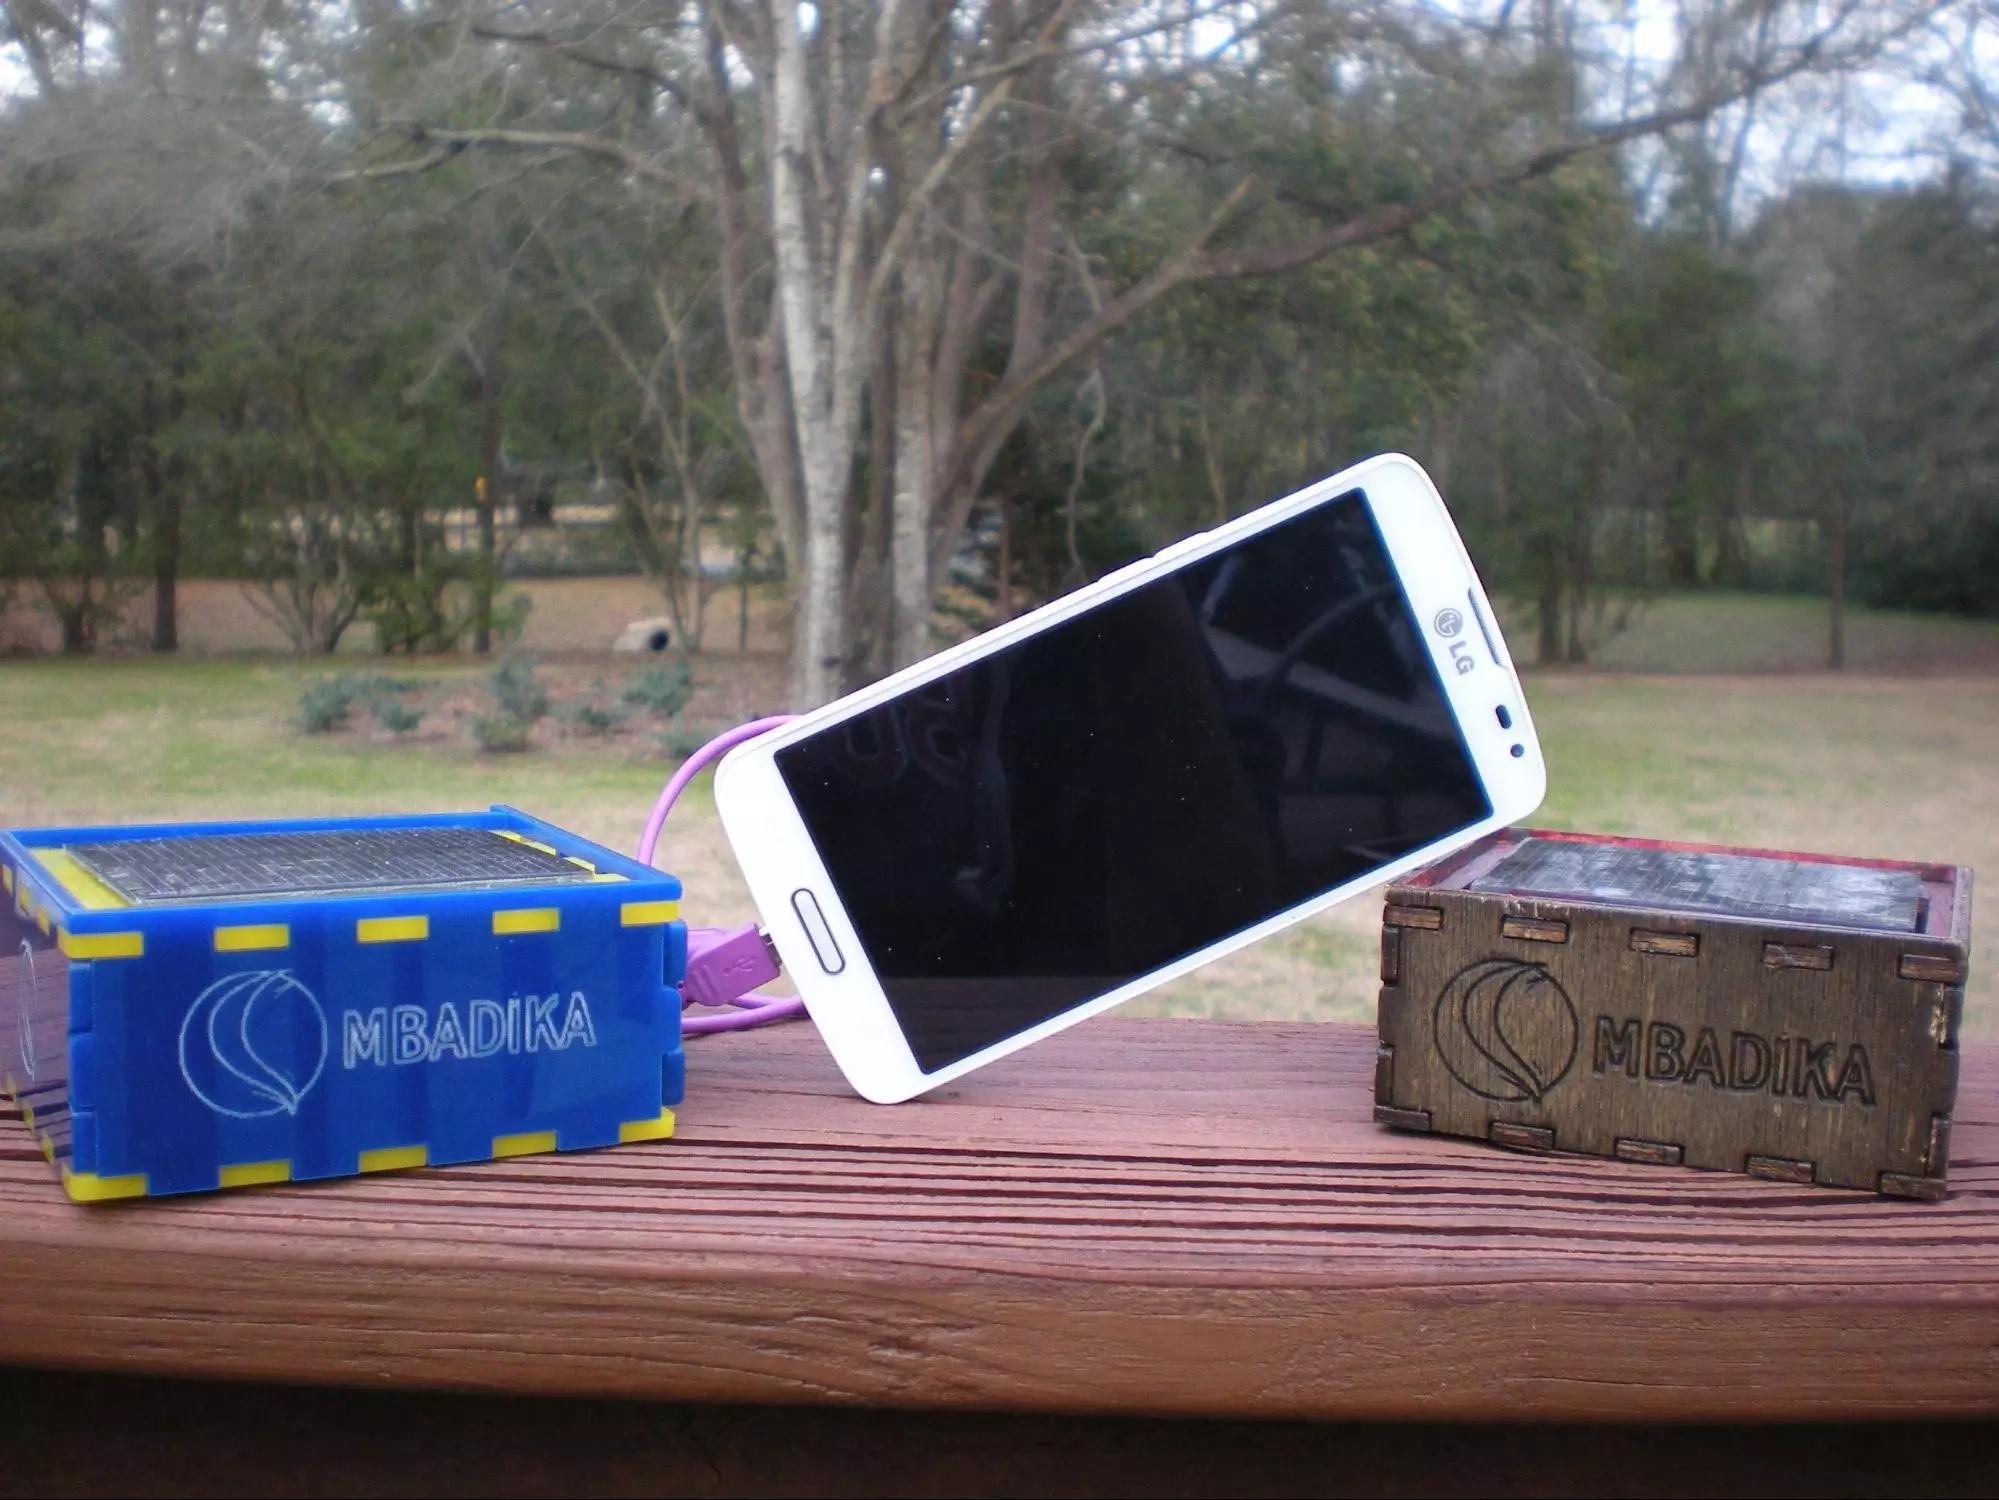 The Mbadika DIY Solar USB Charger Kit, Acrylic and Plywood Versions.